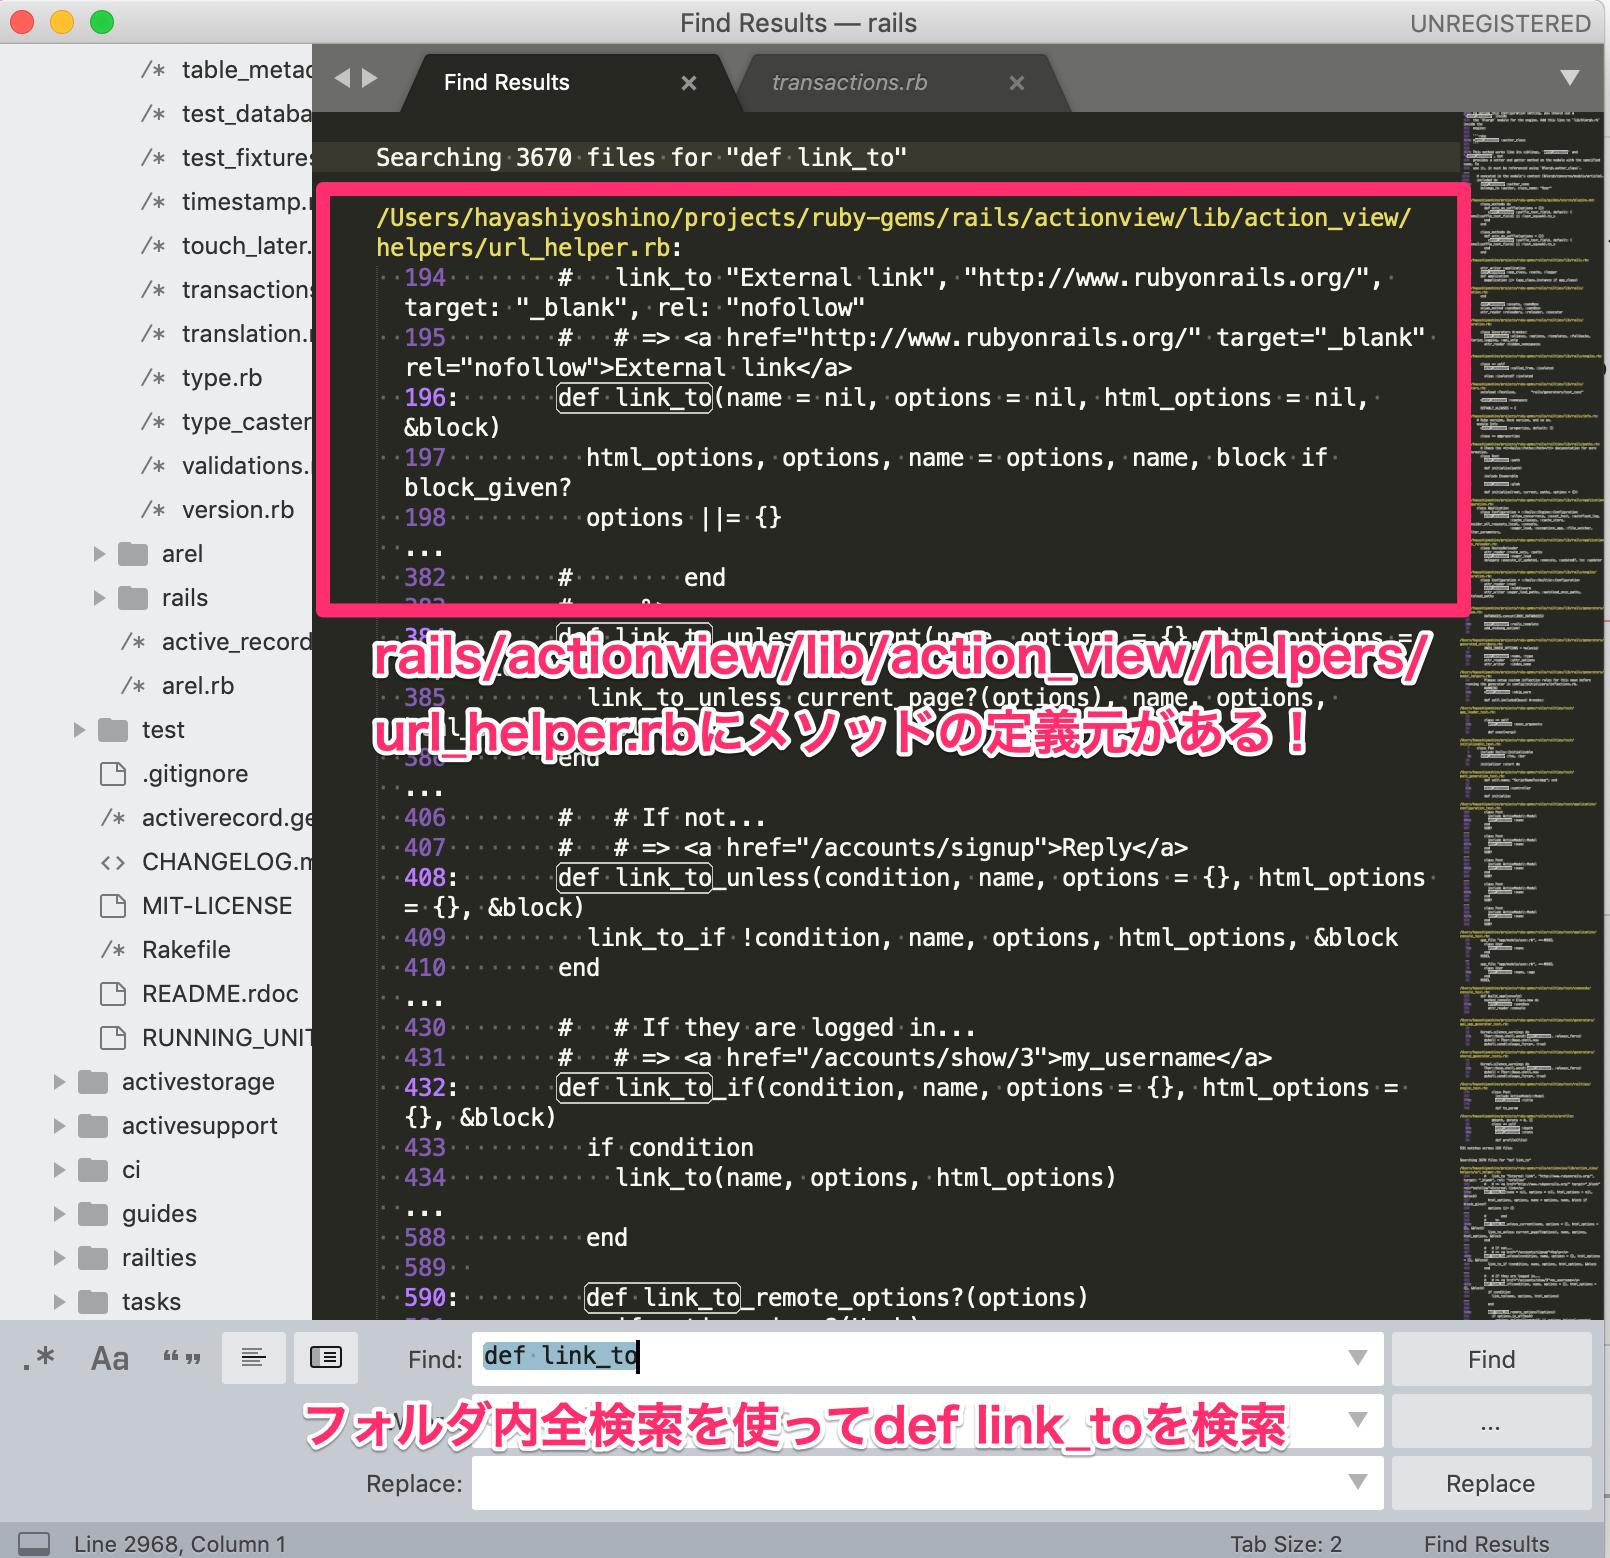 Find_Results_—_rails_と_Railsコードを読んでみた話_-_Qiita.png